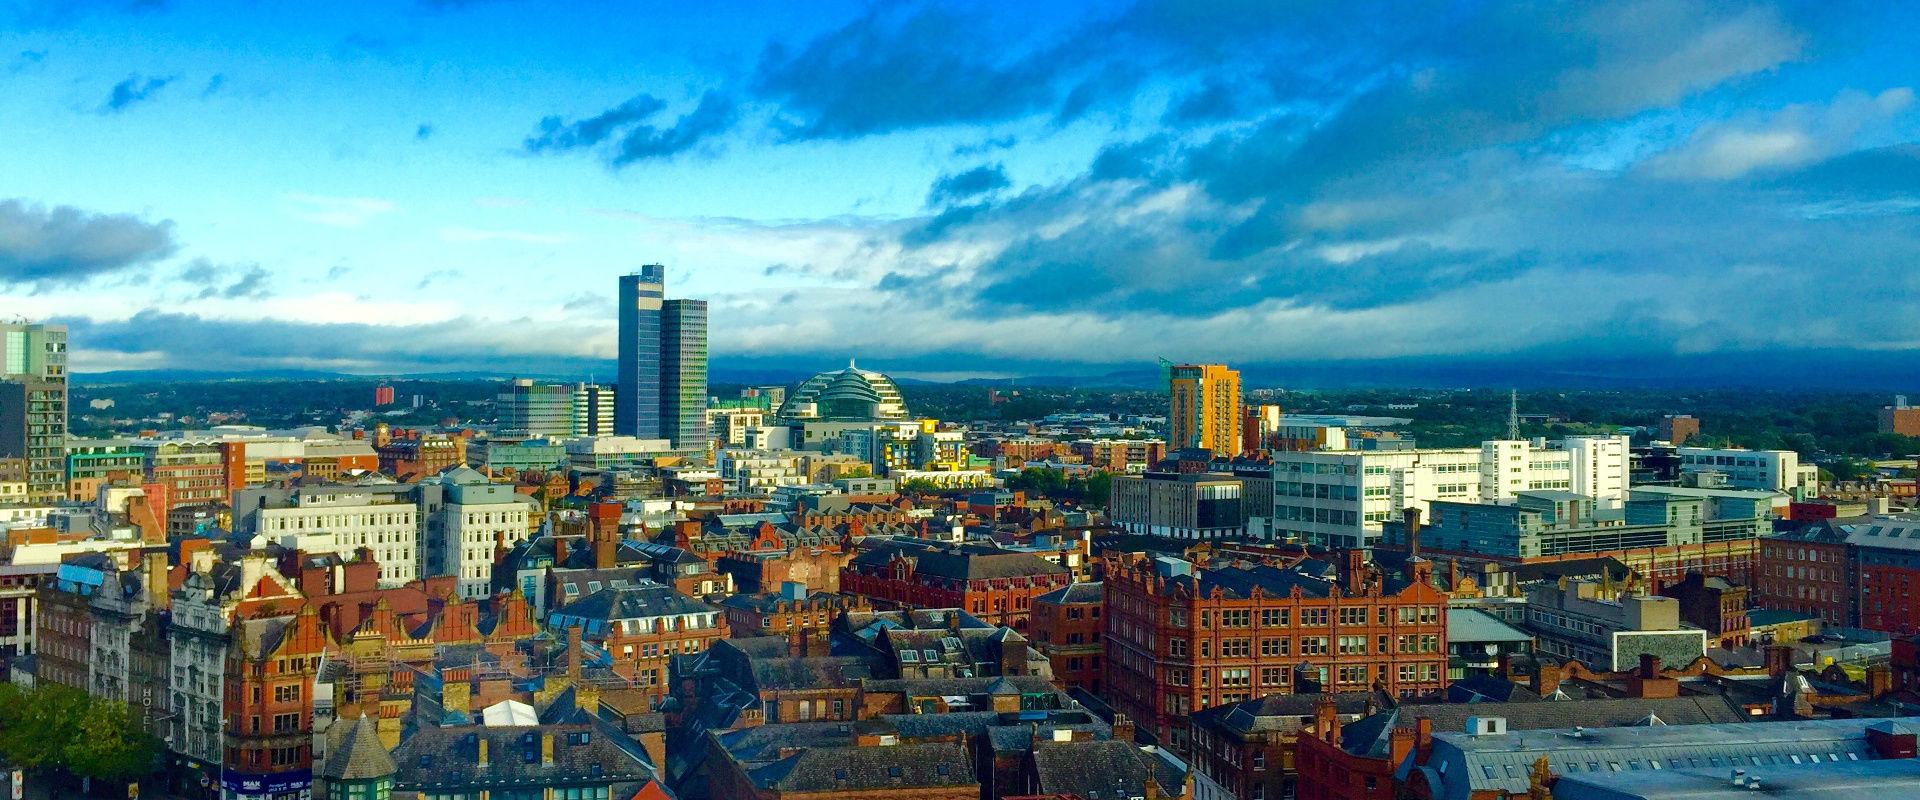 Coronavirus in Manchester: VE Day Bank Holiday update